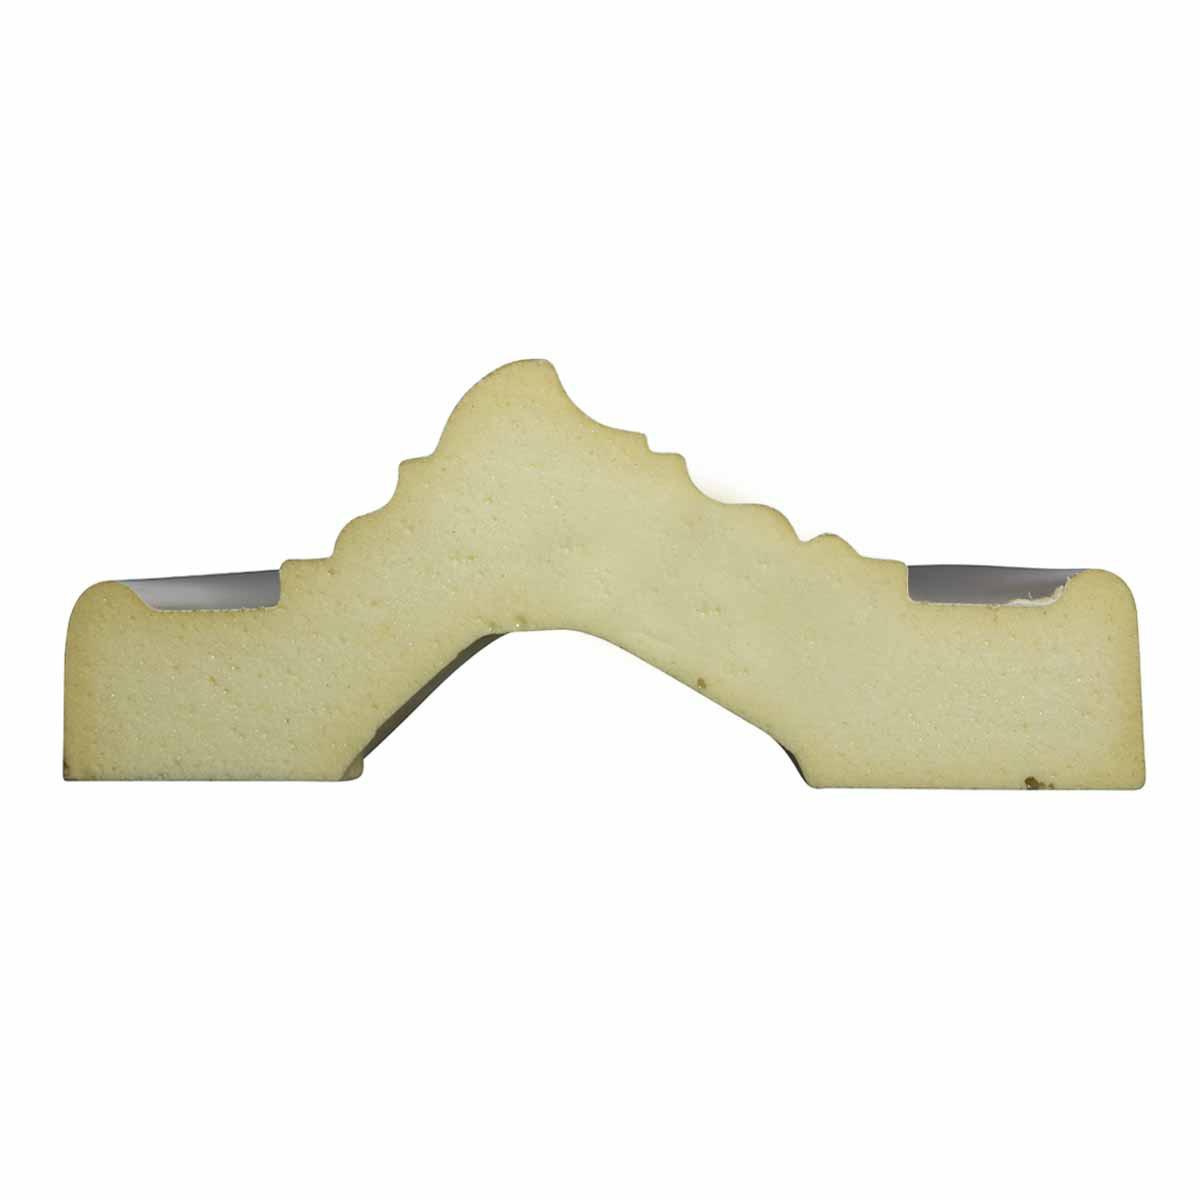 Cornice White Urethane 23.5 Sample of 11537 Cornice Cornice Moulding Cornice Molding